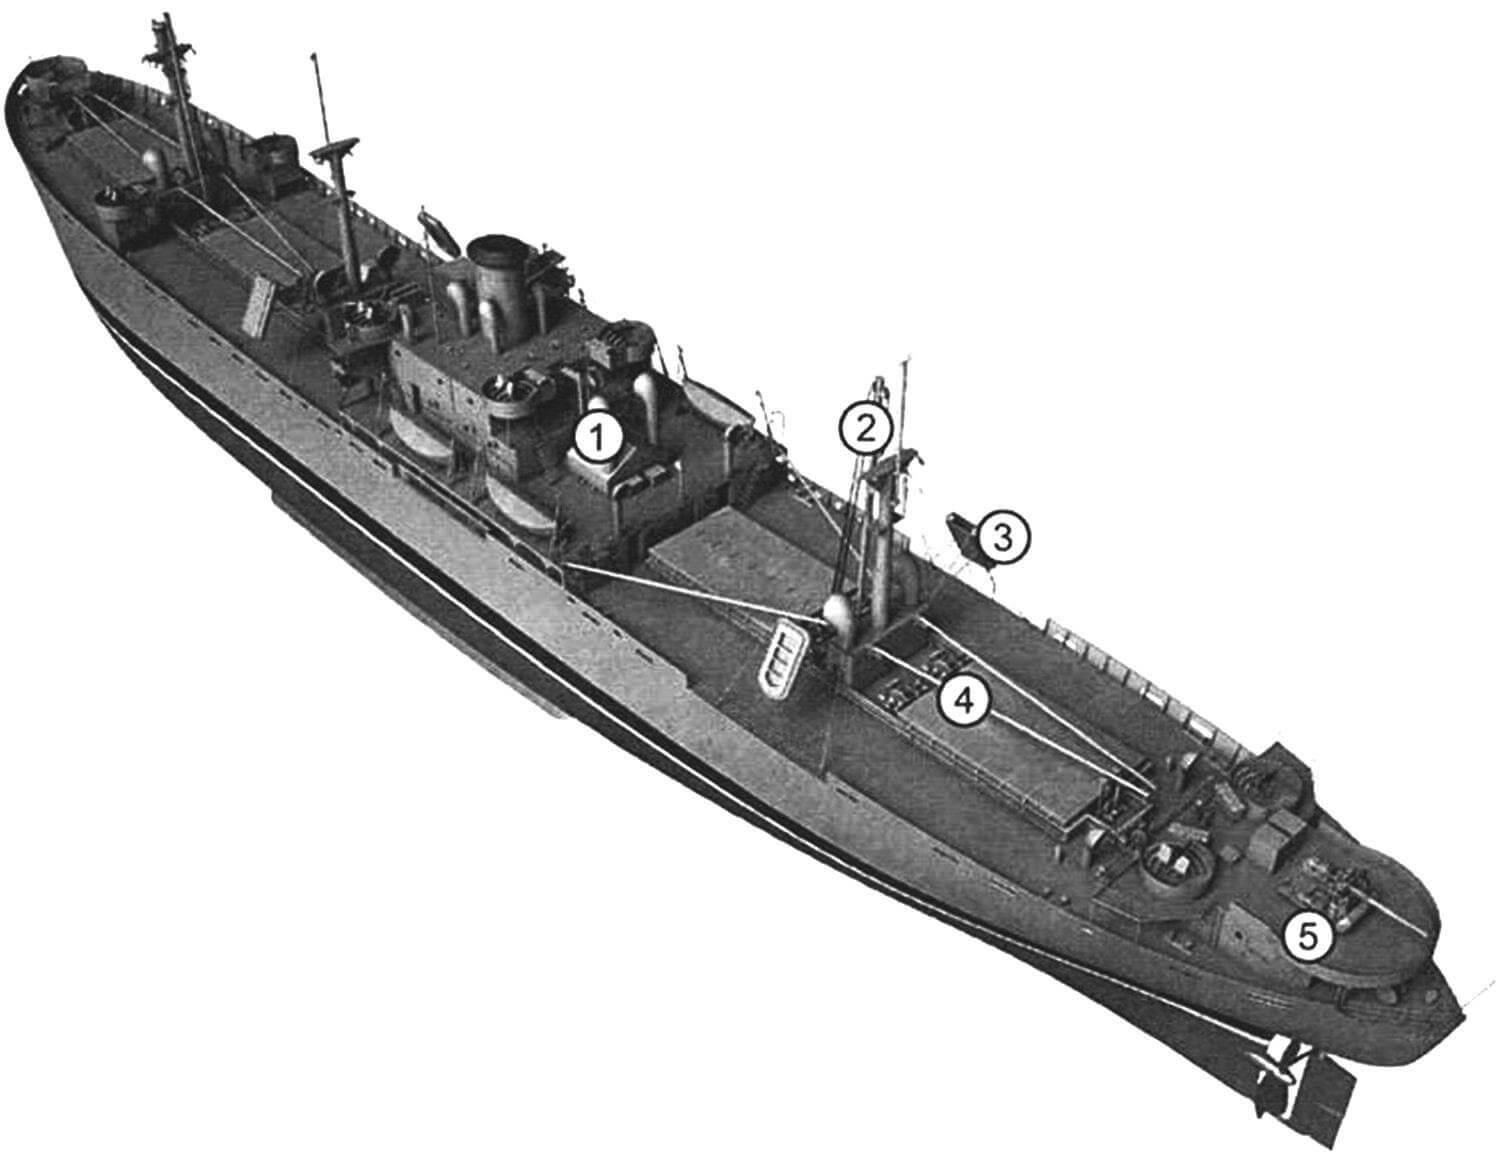 Компьютерная прорисовка внешнего вила судна типа «Либерти»